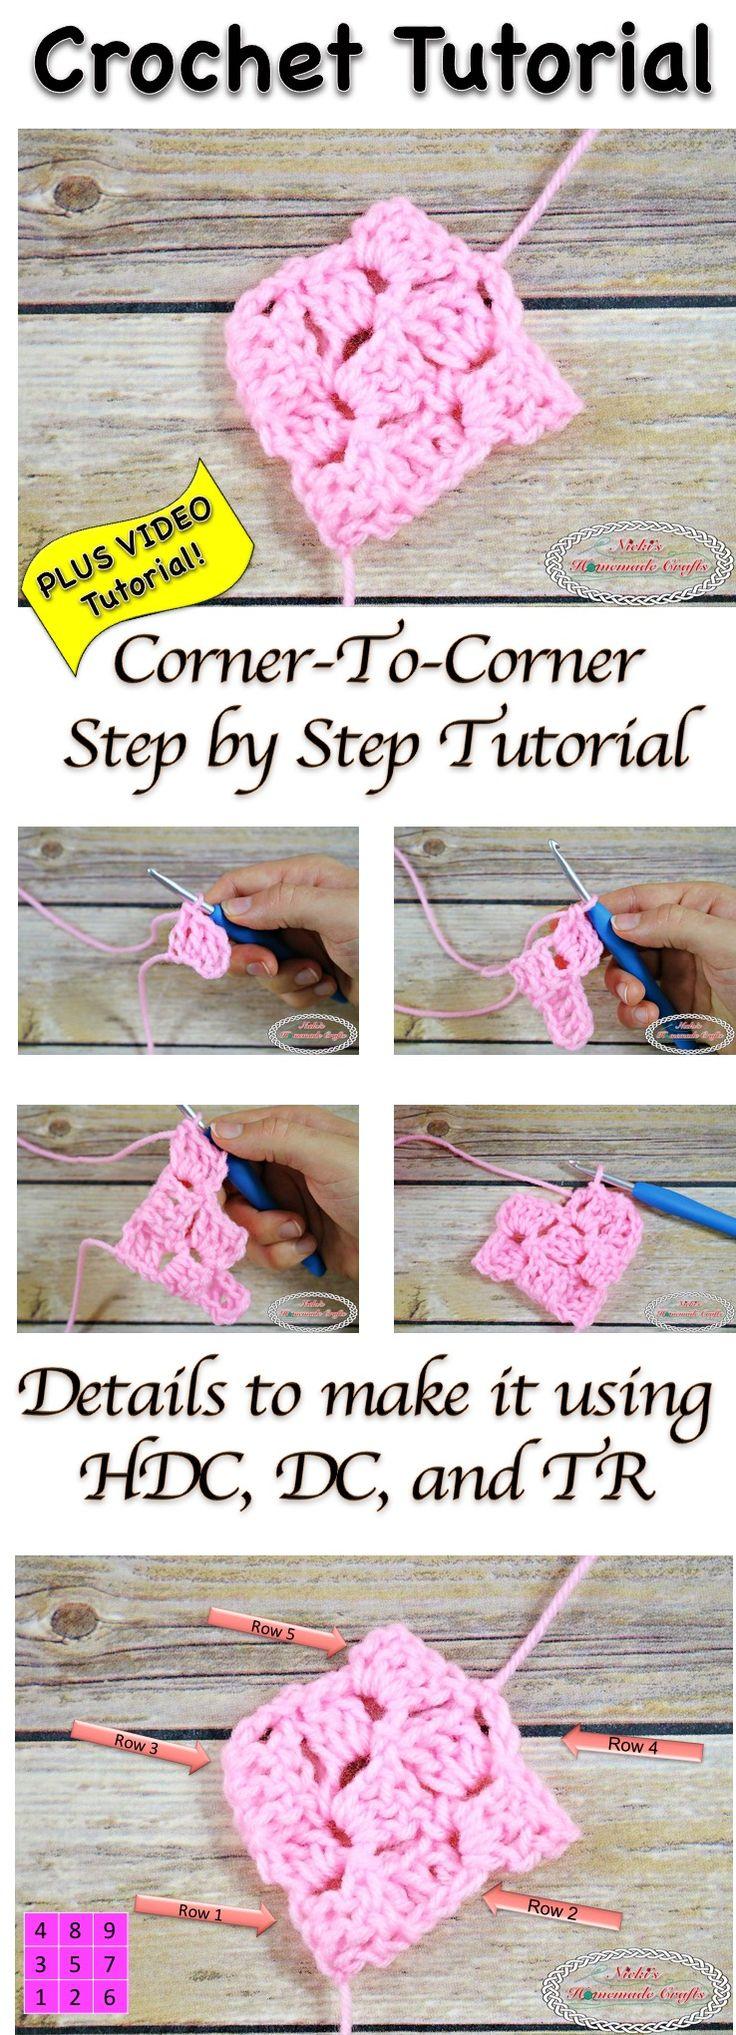 Tutorial Do Cmap Tools: How To Do The Corner-To-Corner Aka C2C